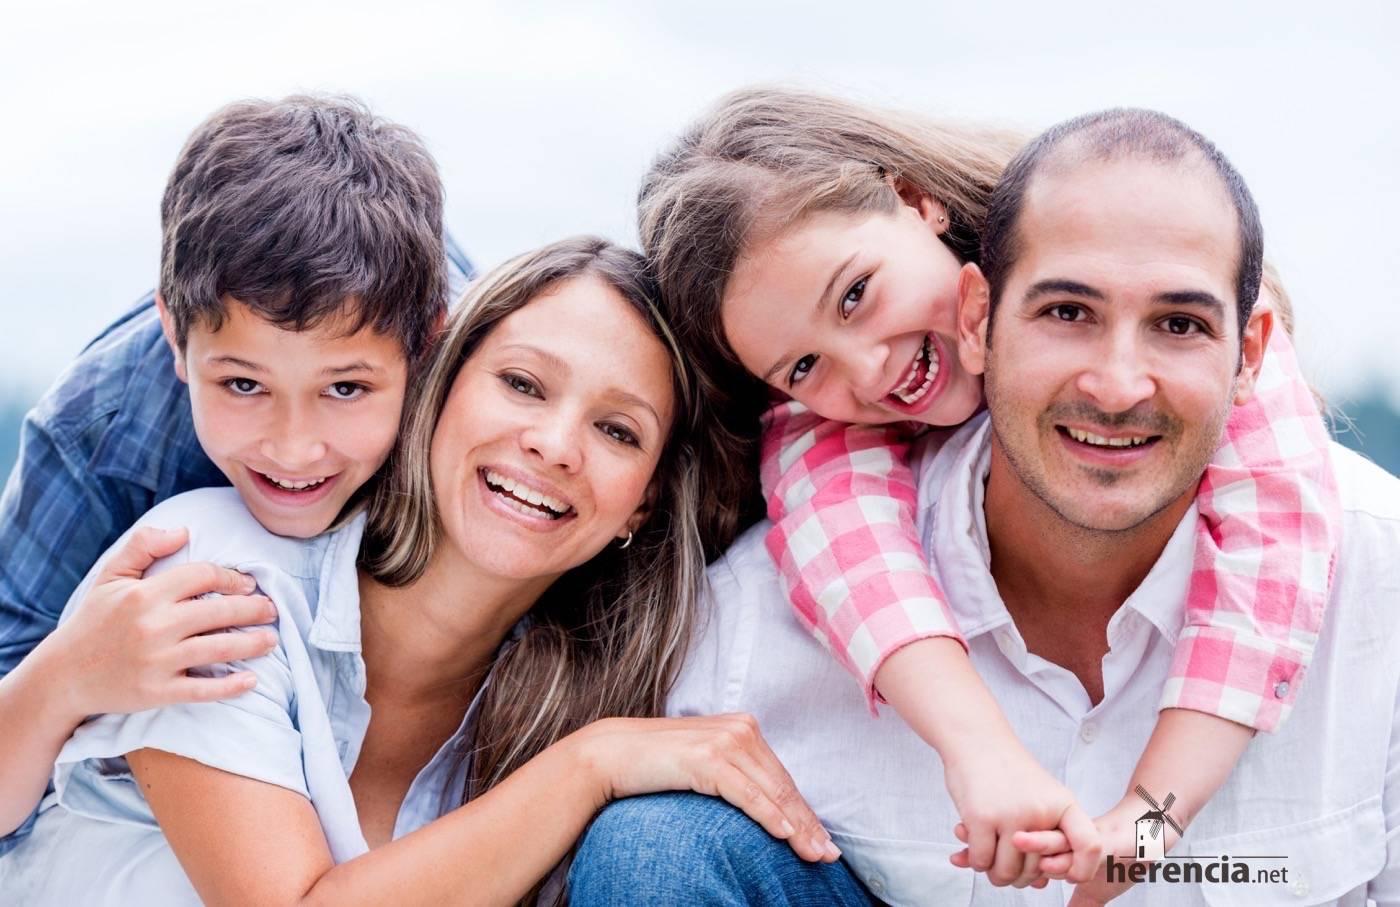 Familia con hijos adoptados.